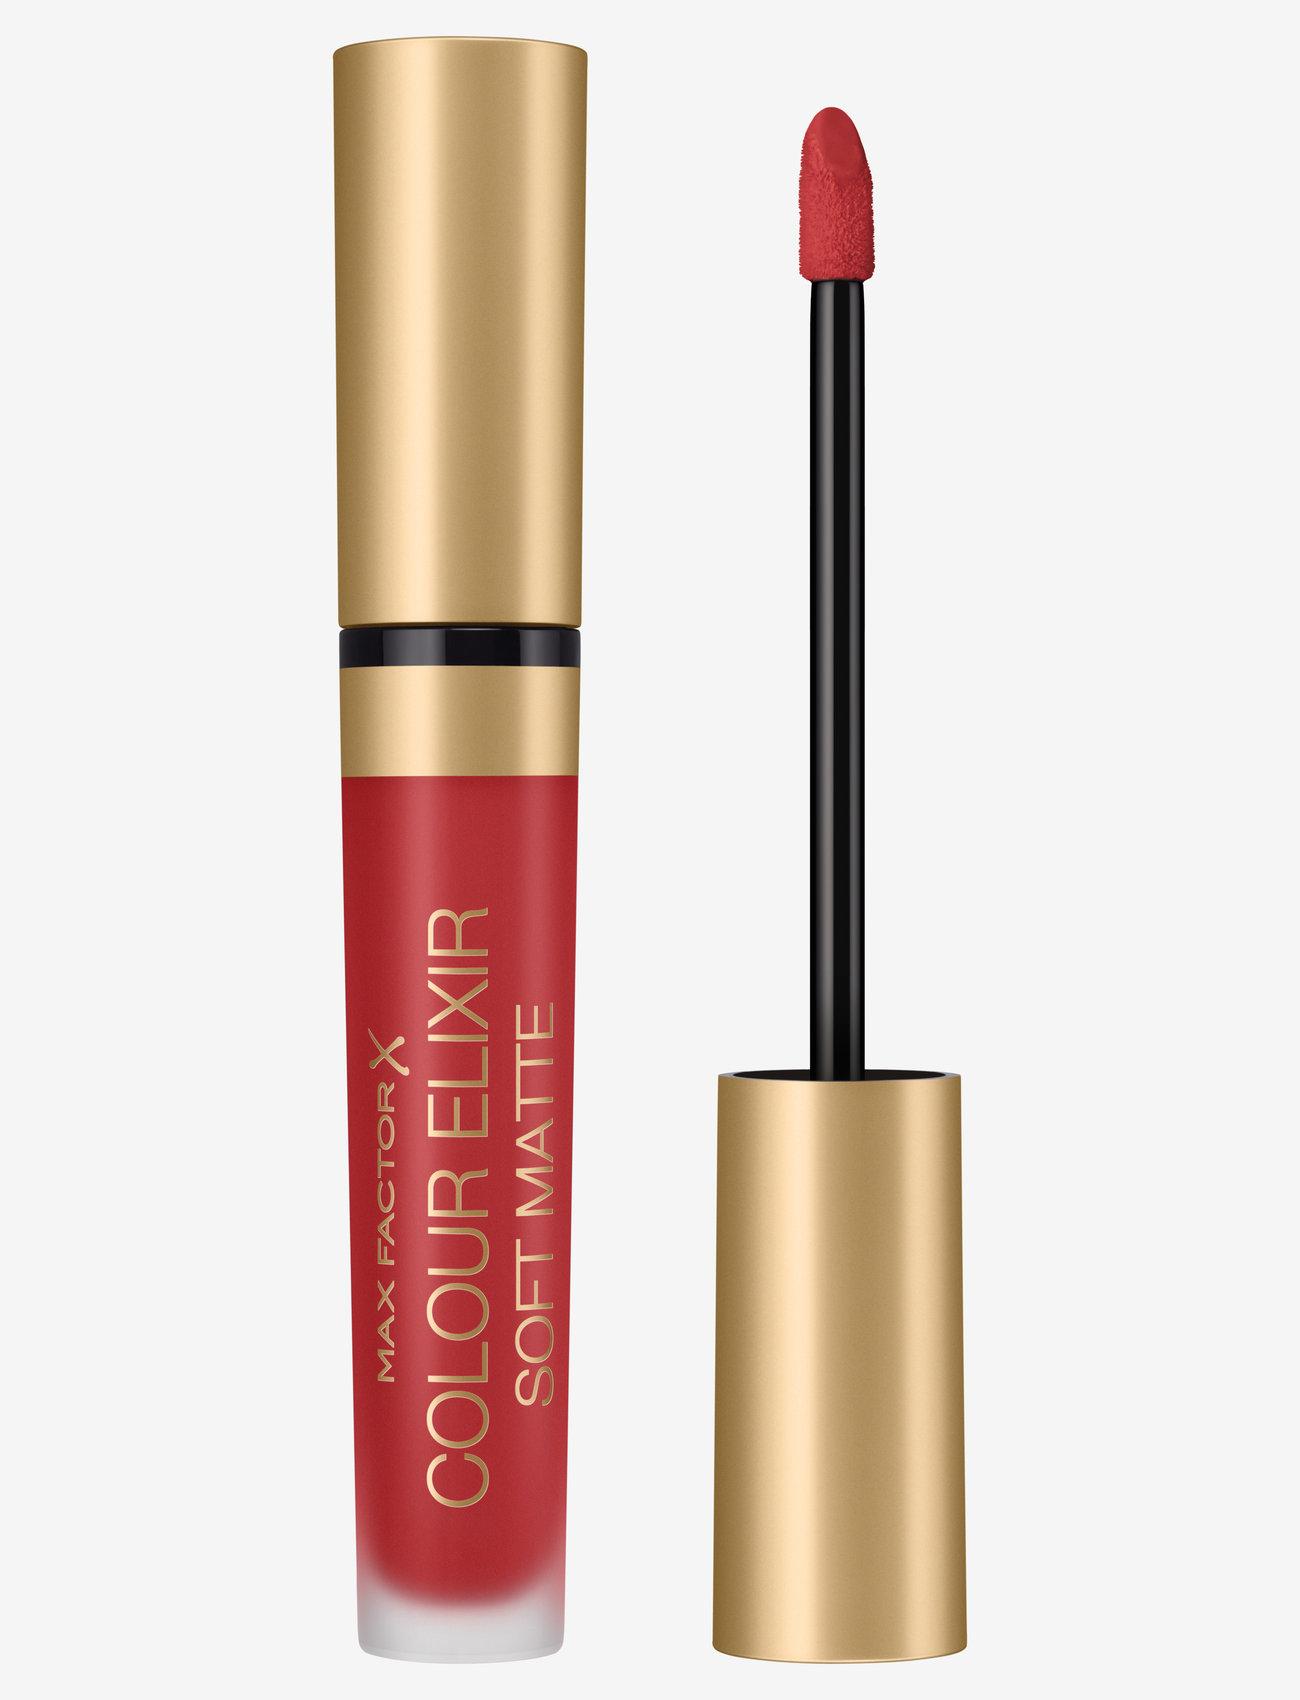 Max Factor - Color Elixir Soft Matte Lipstick 30 Crushed Ruby - läppstift - 30 crushed ruby - 0